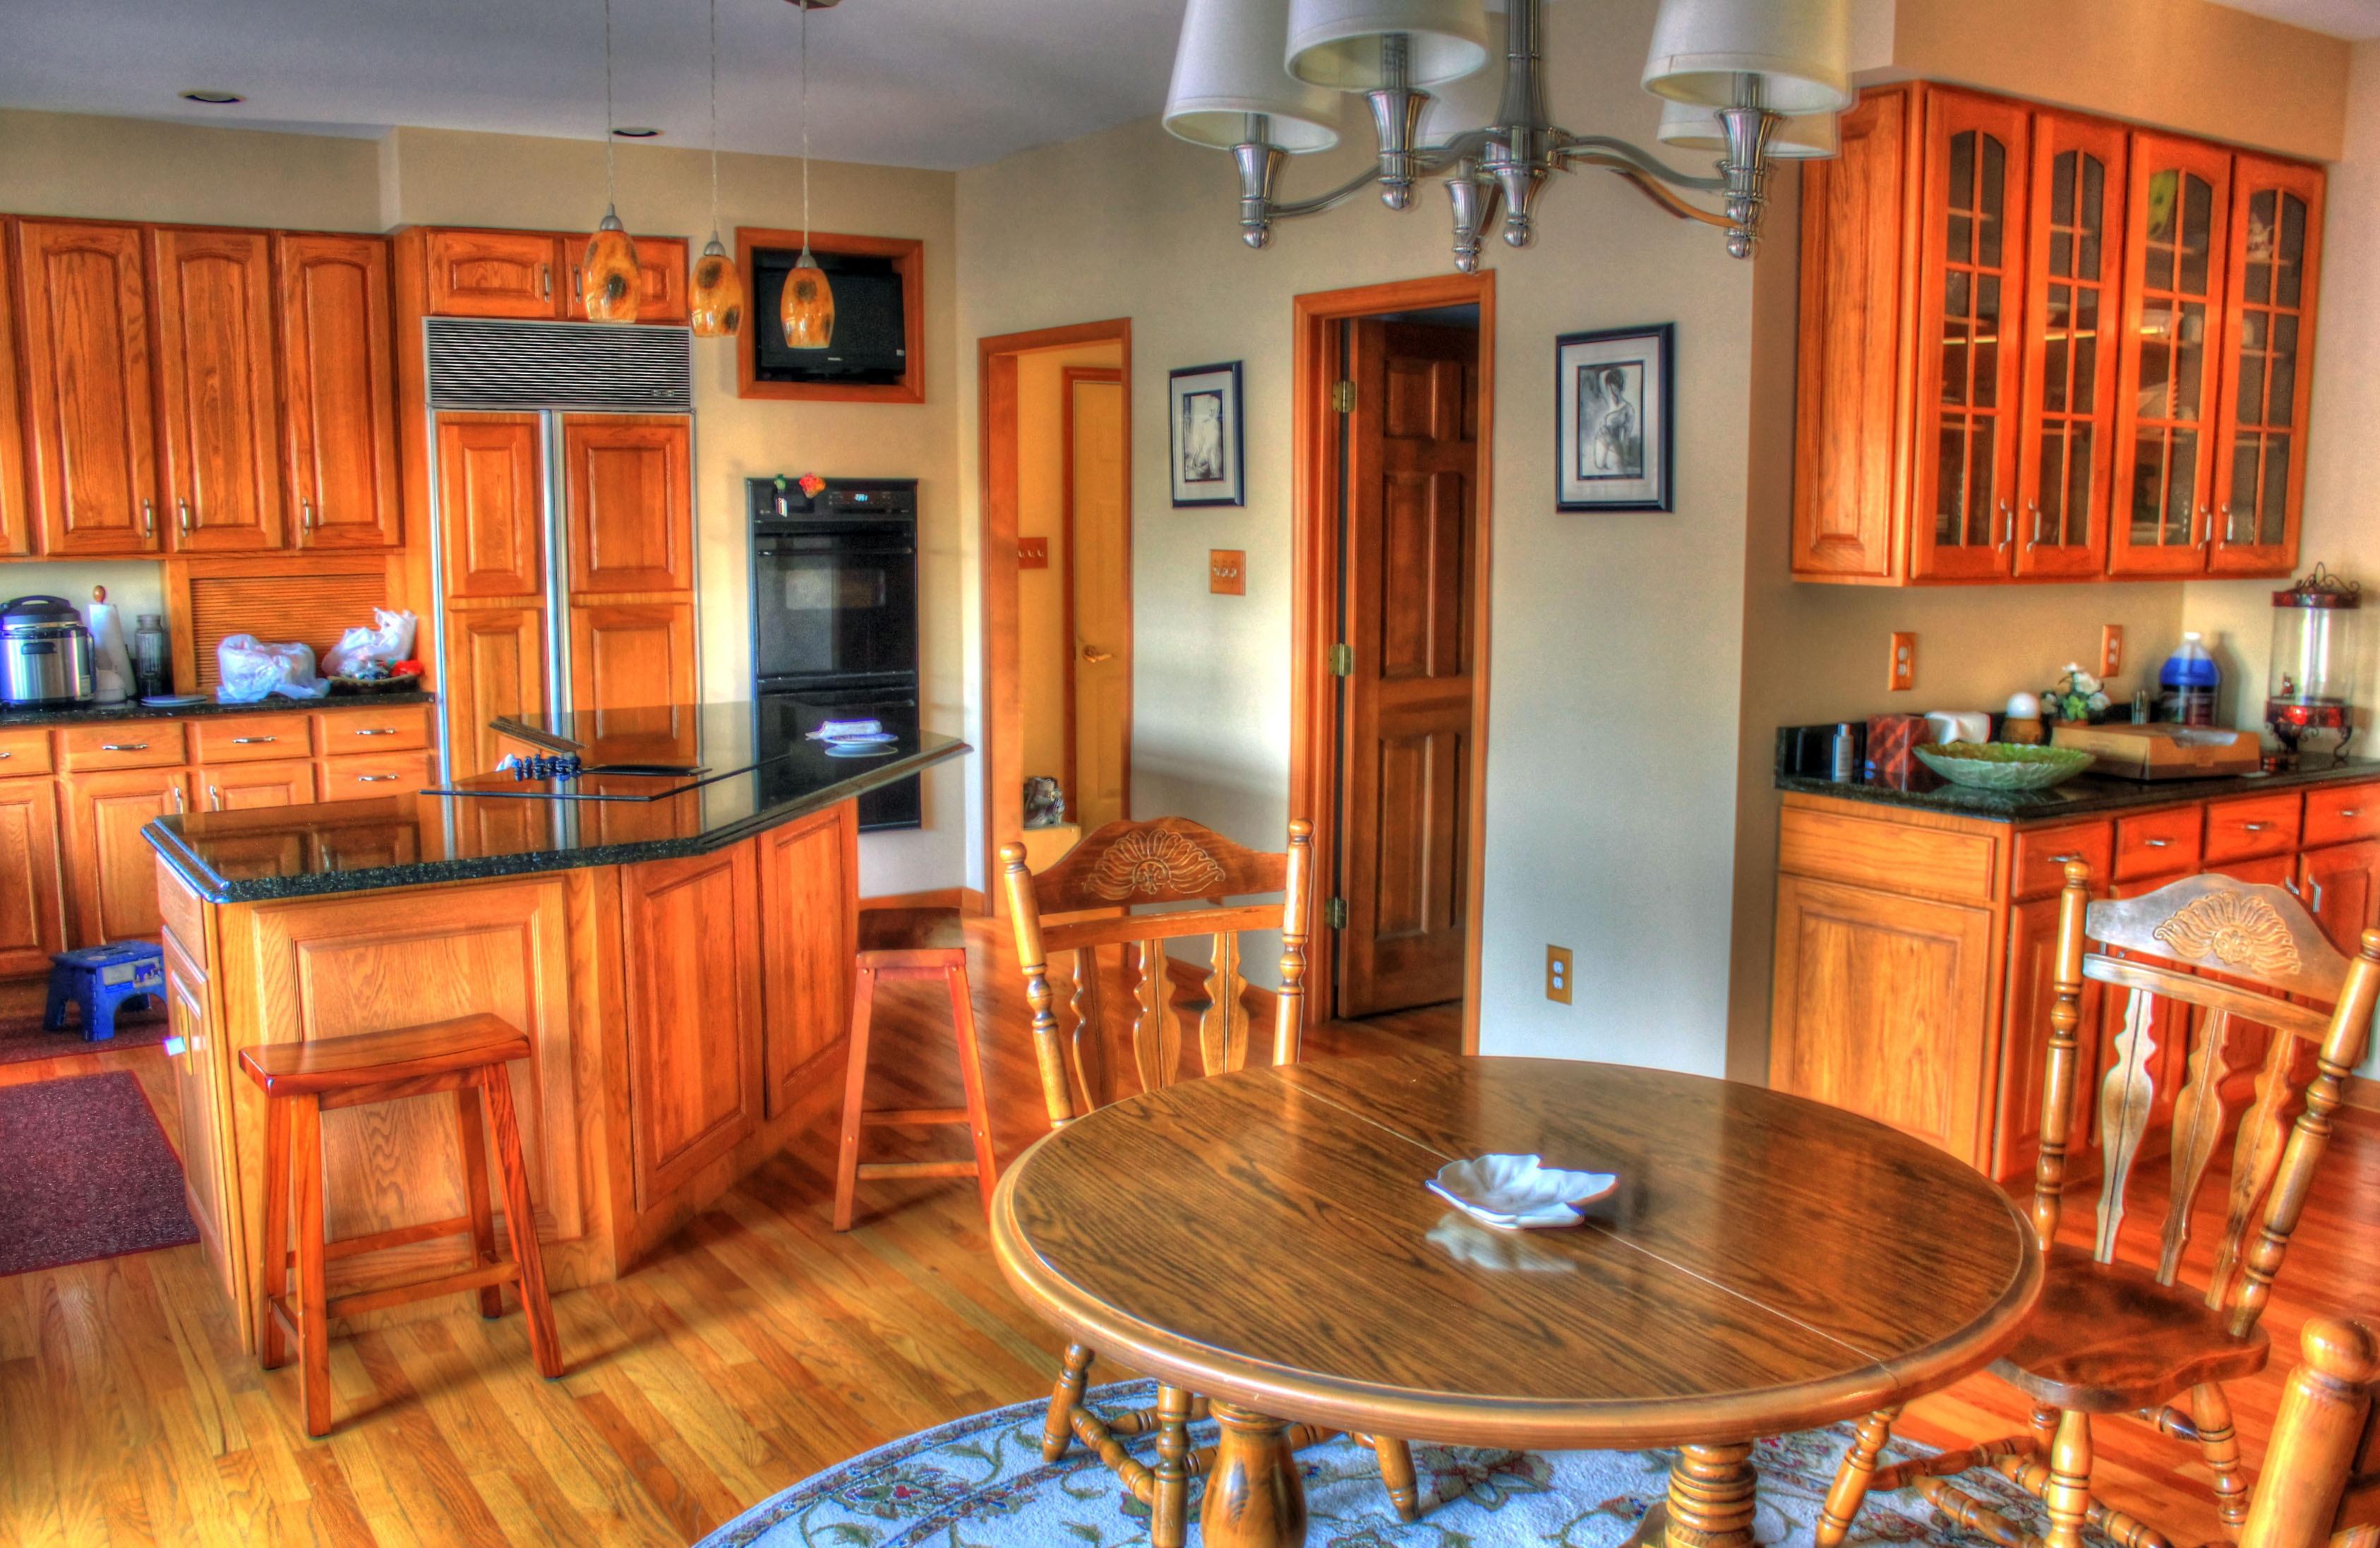 Fotos gratis : villa, palacio, interior, mostrador, cabaña, cocina ...